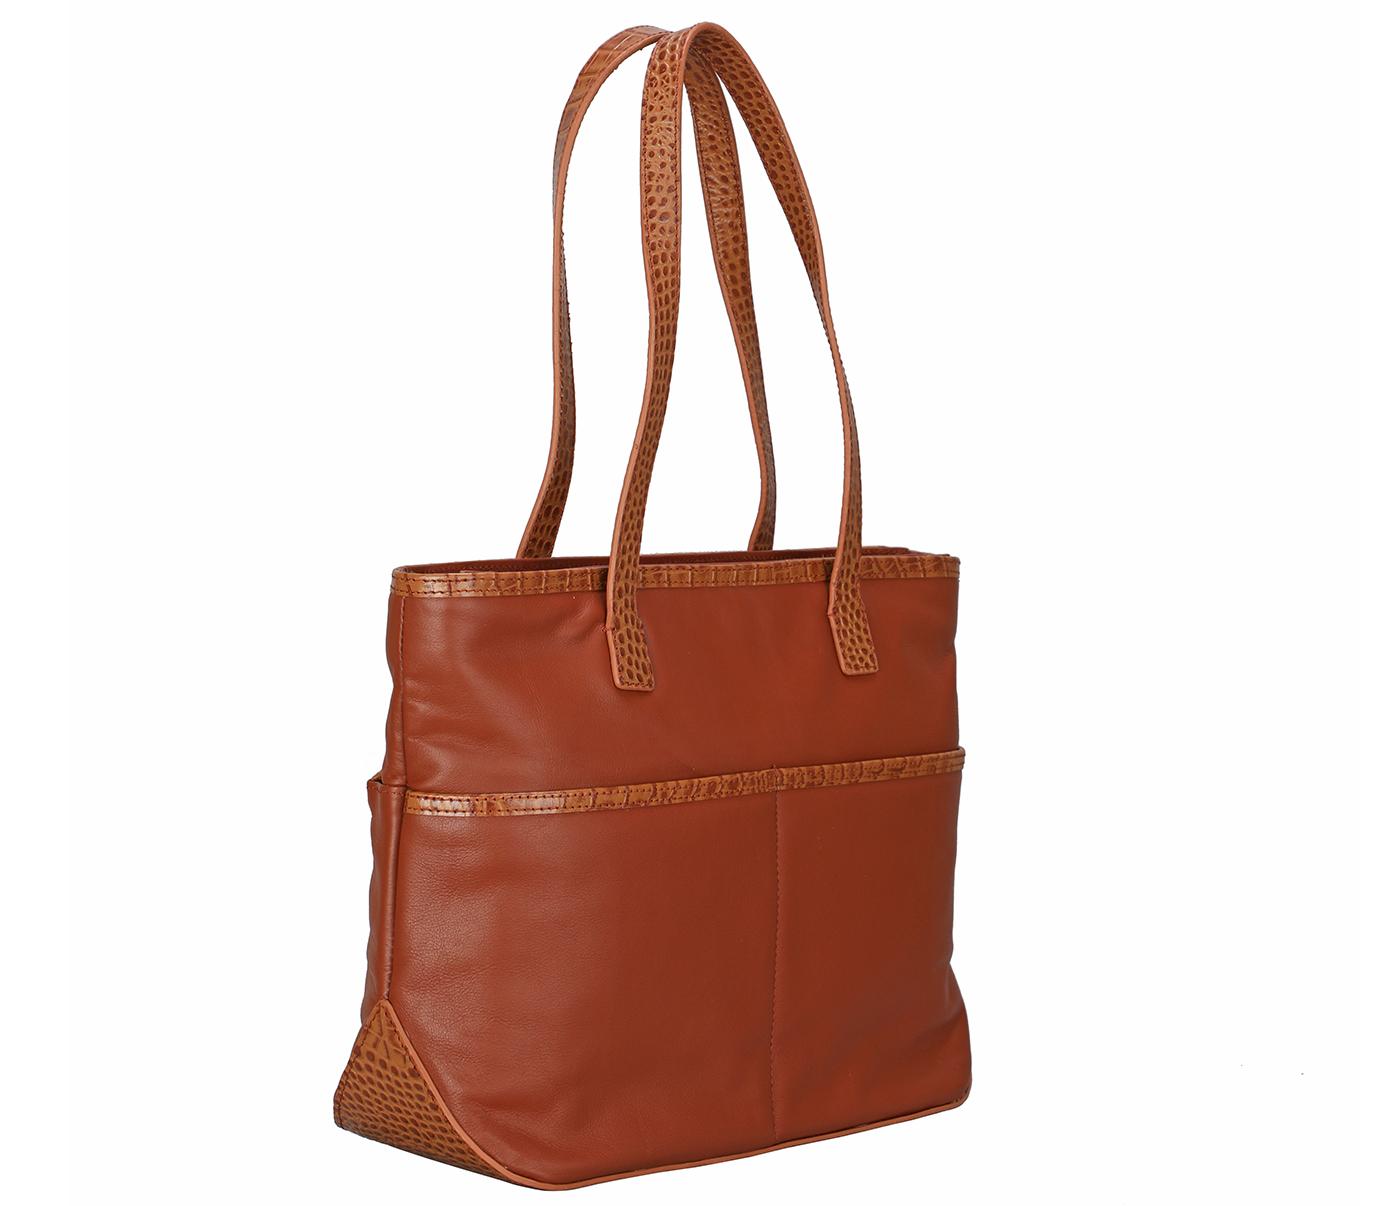 B877-Norita-Shoulder work bag in Genuine Leather - Tan